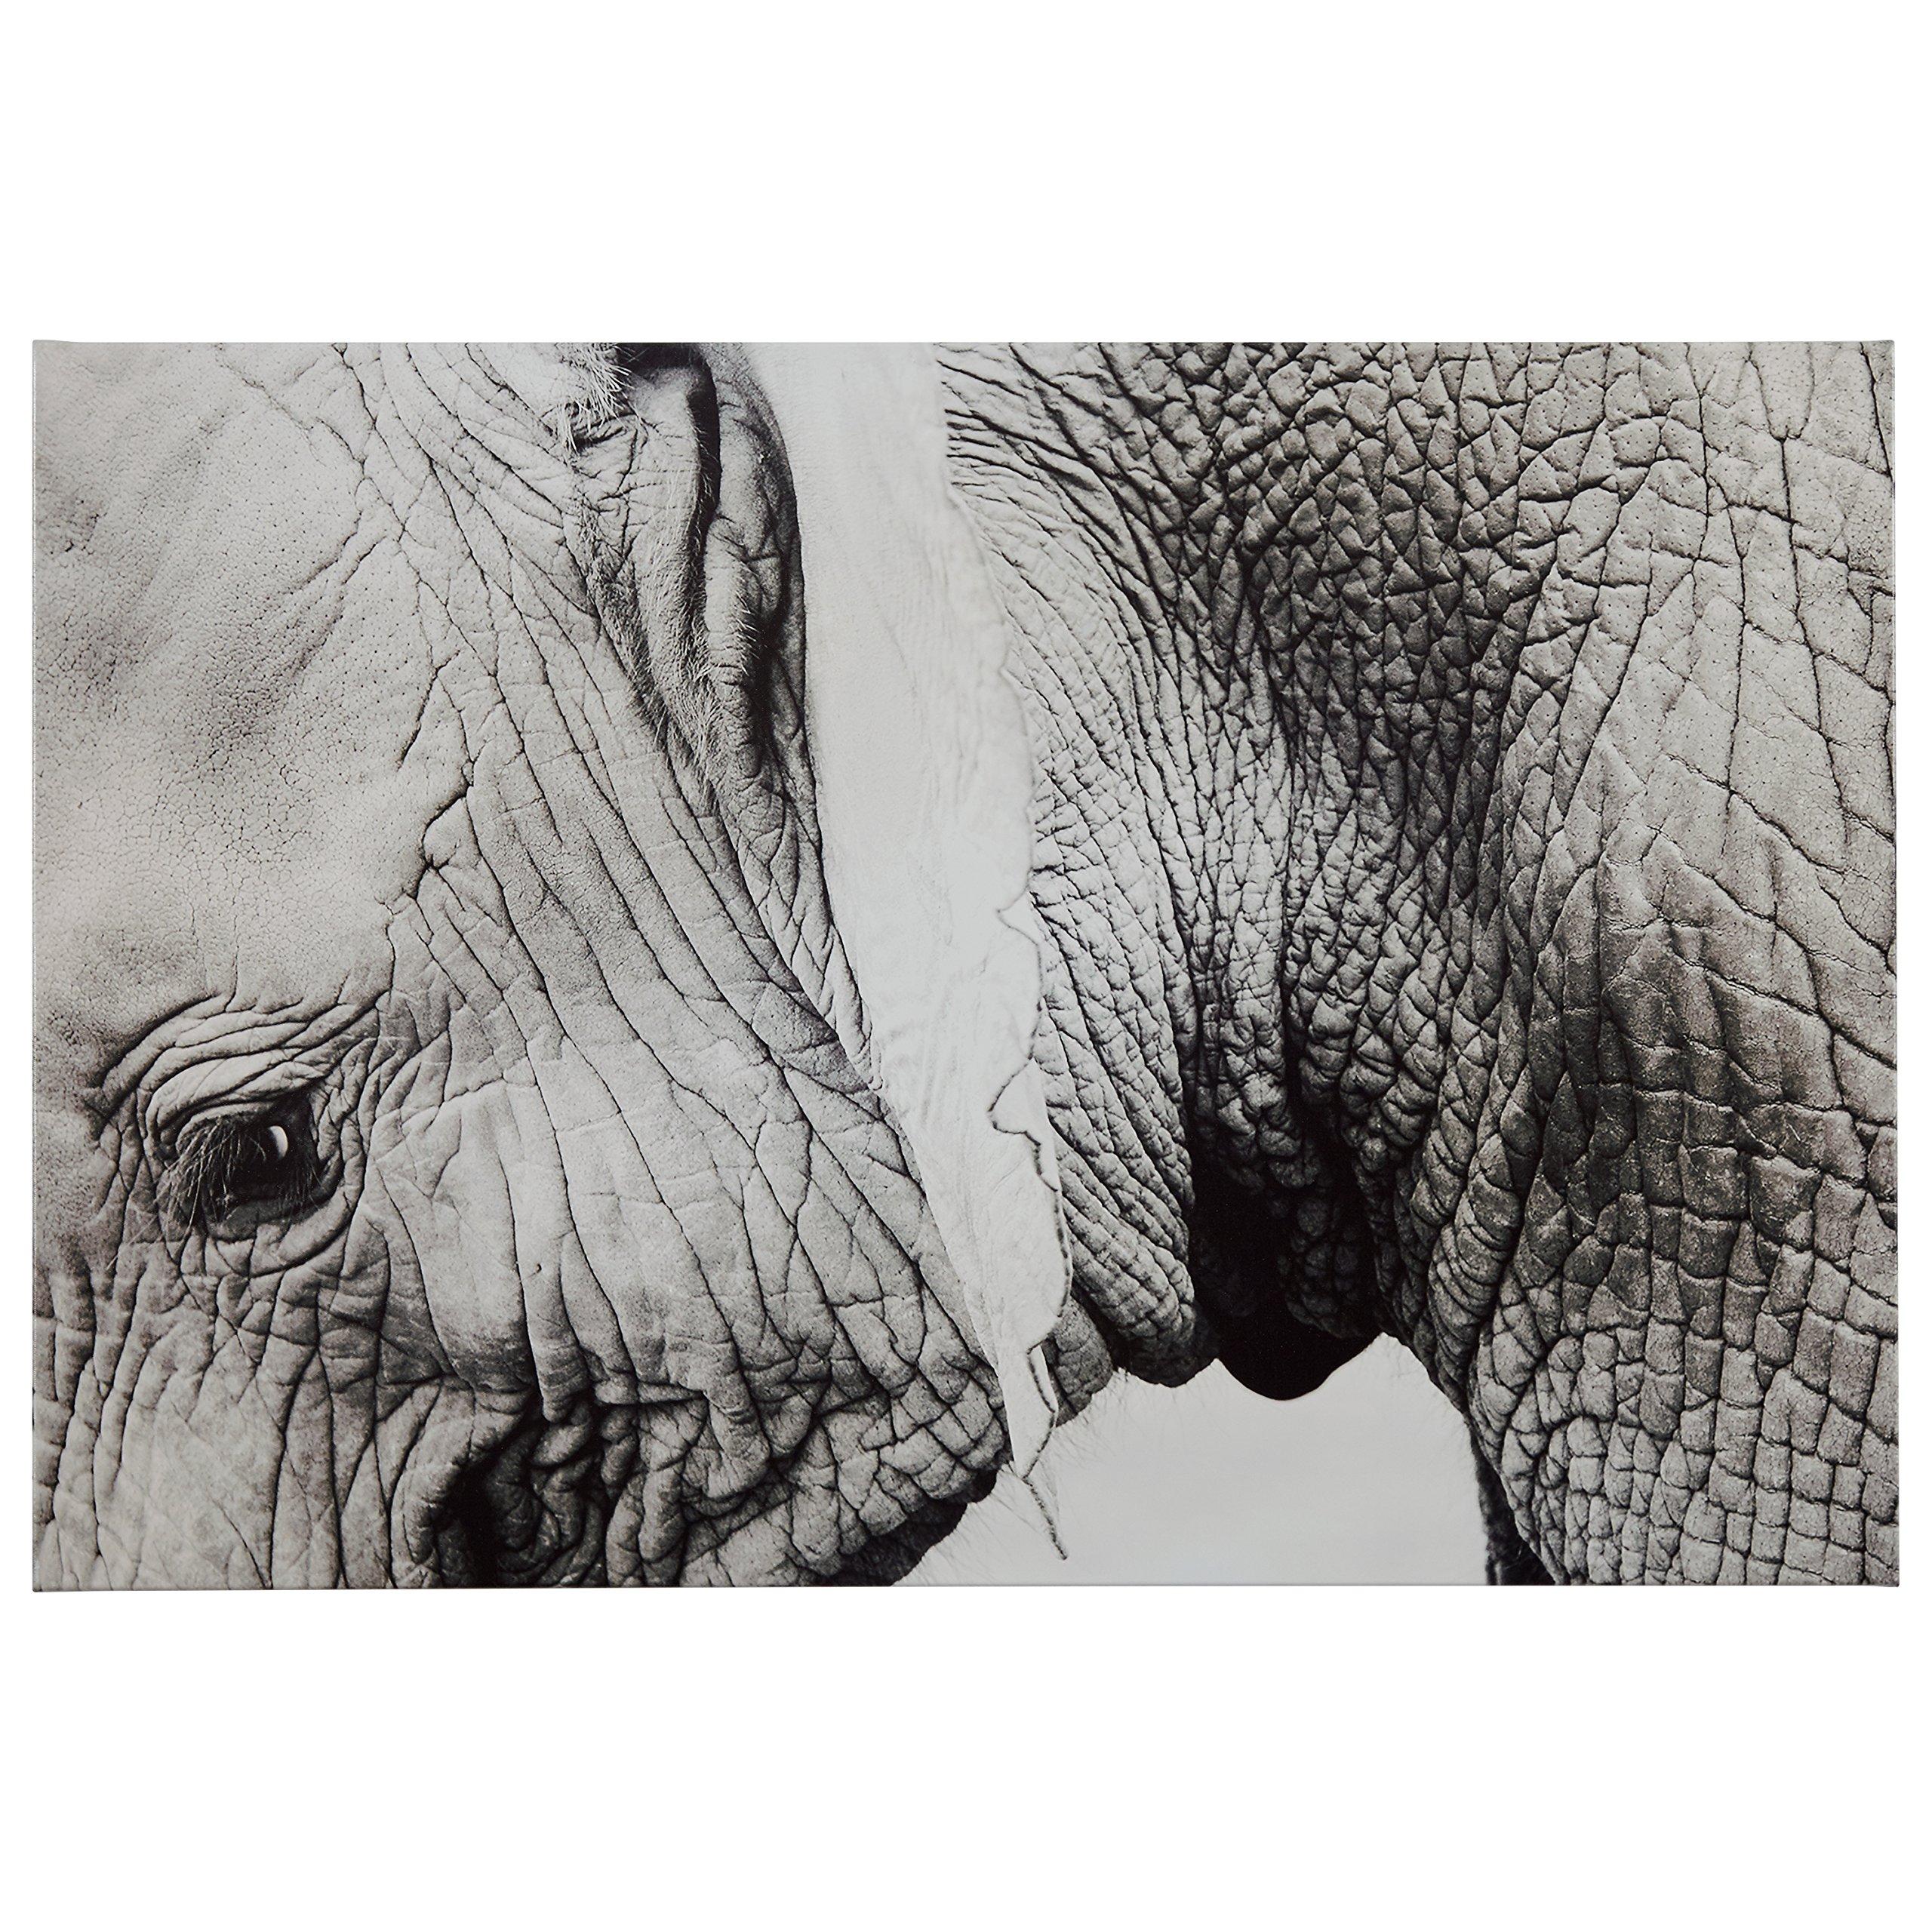 Up Close Black and White Elephant Photo Canvas Print, 45'' x 30''